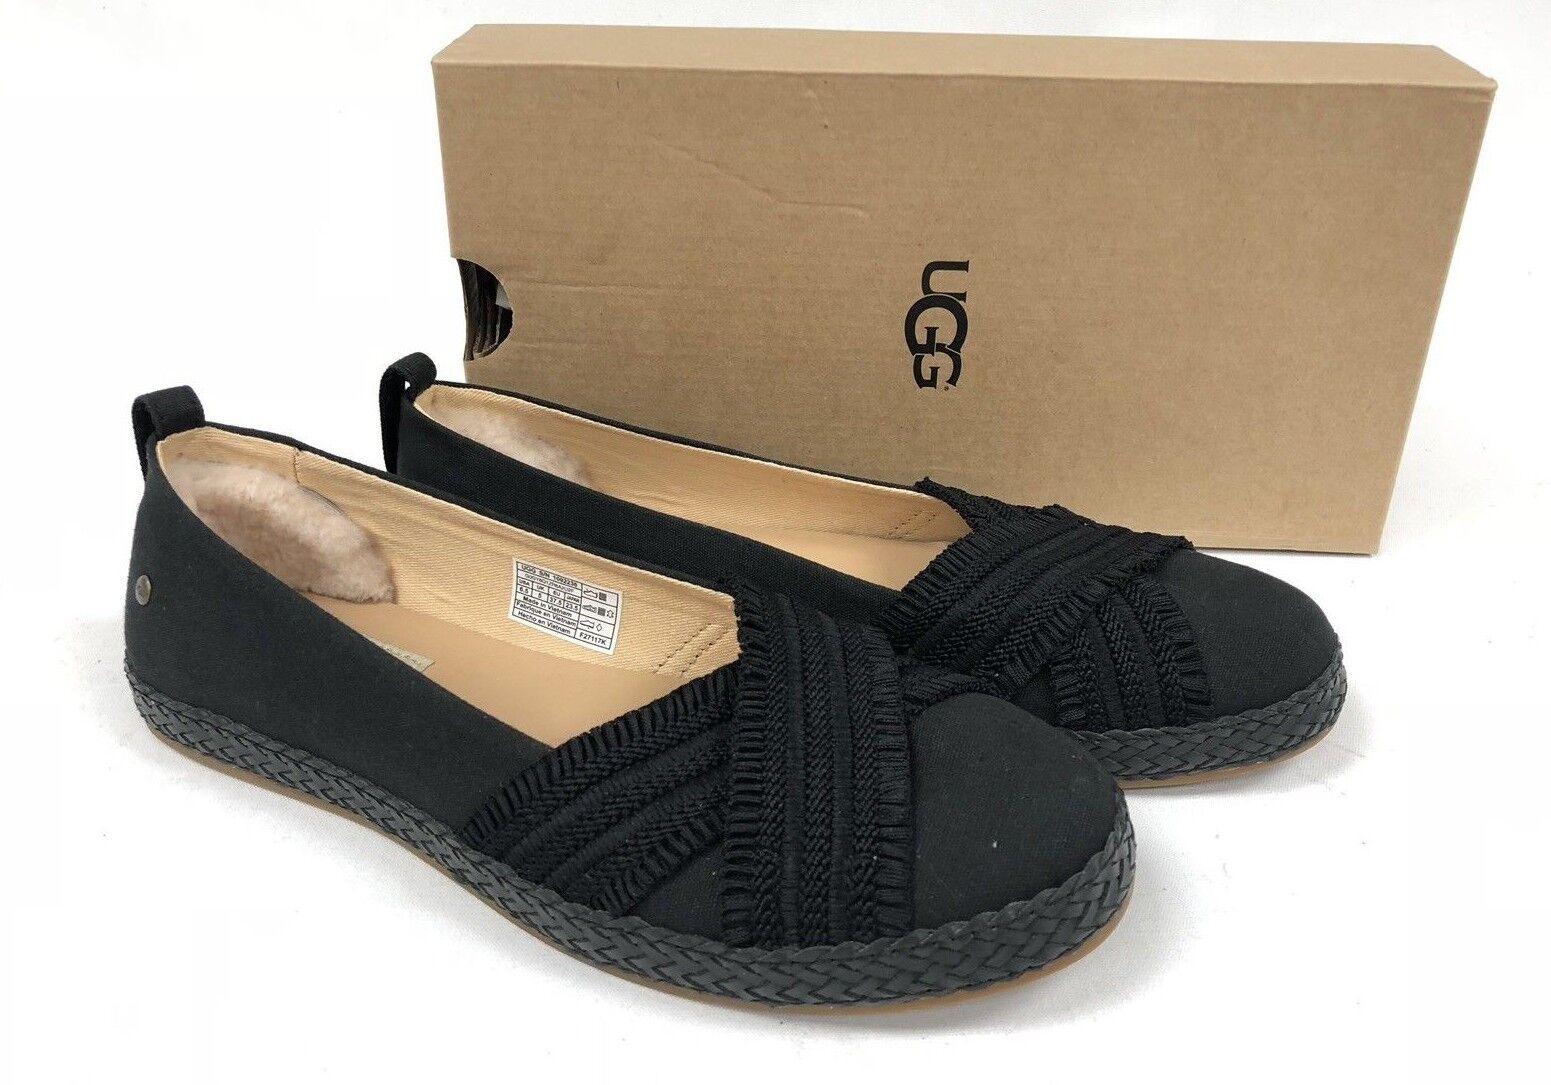 UGG Australia Ynez Slip On Flat 1092238 Black Women's Shoes Flats Canvas